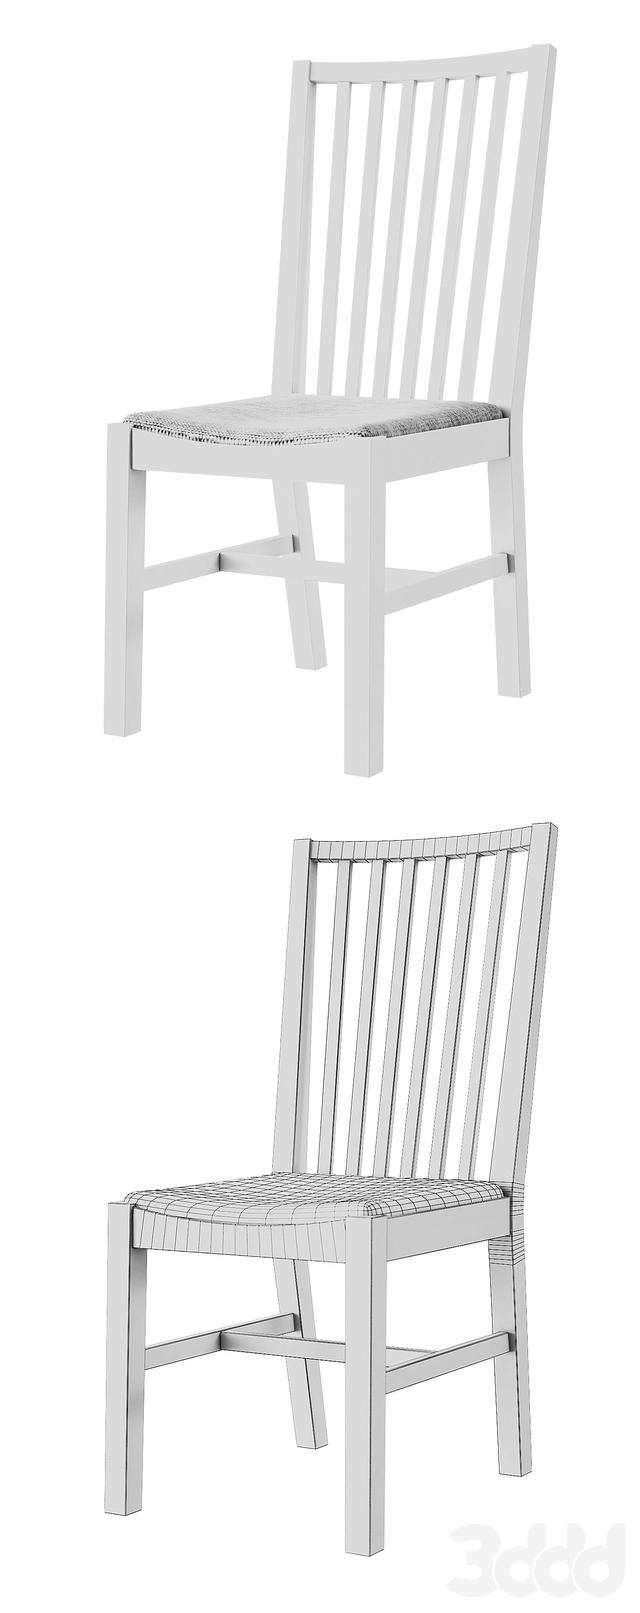 IKEA BJURSTA AND NORRNAS